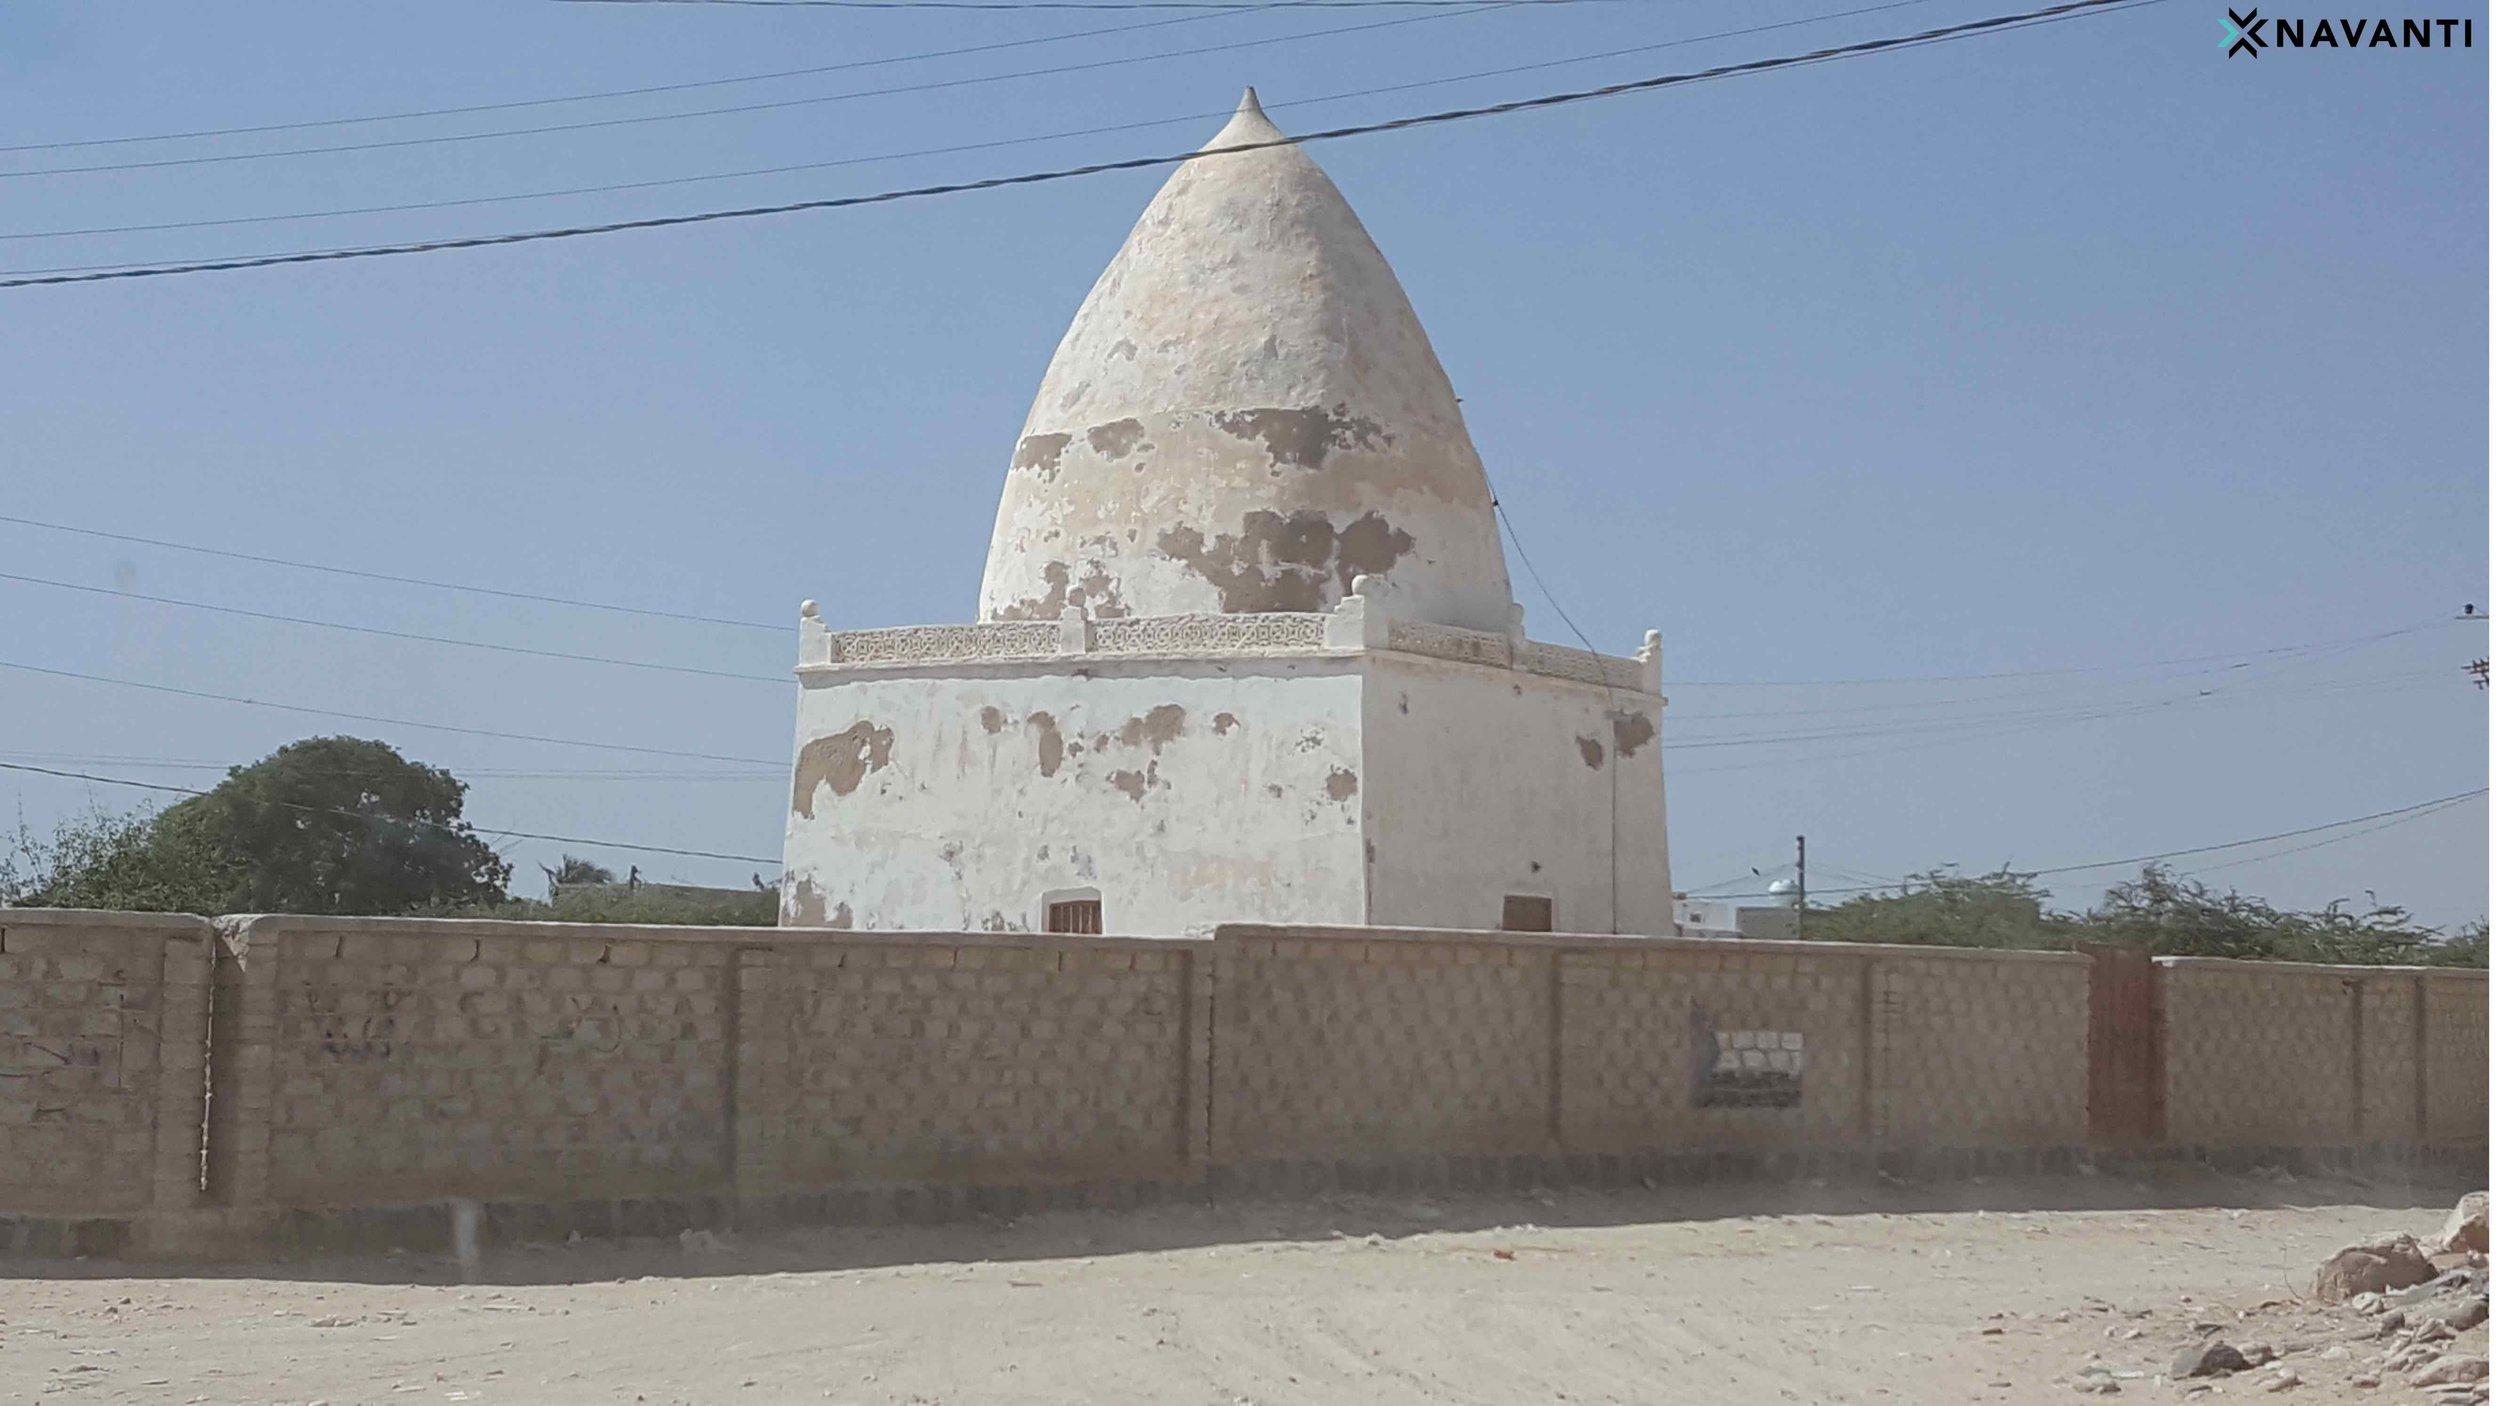 Sufi shrine in Sayhut, al-Mahra. Source: Navanti